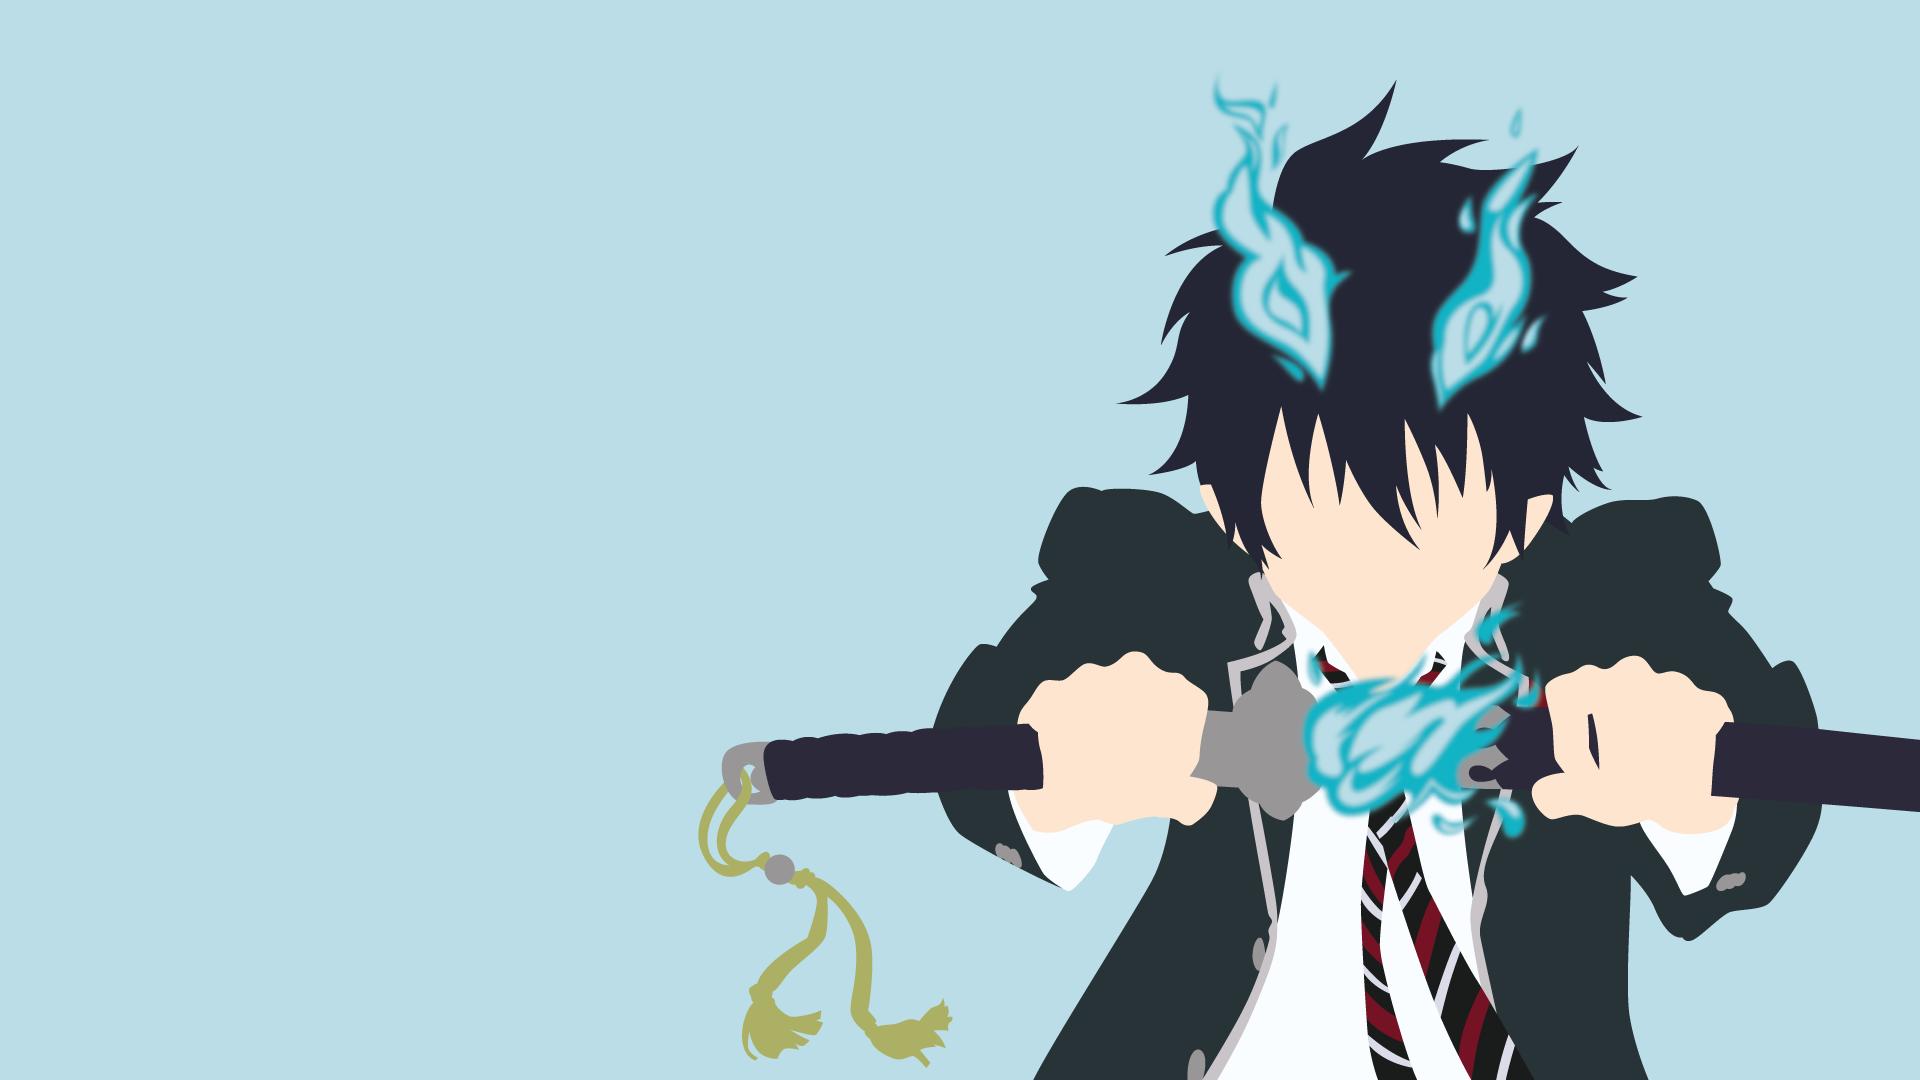 Rin Okumura Hd Wallpaper Background Image 1920x1080 Id